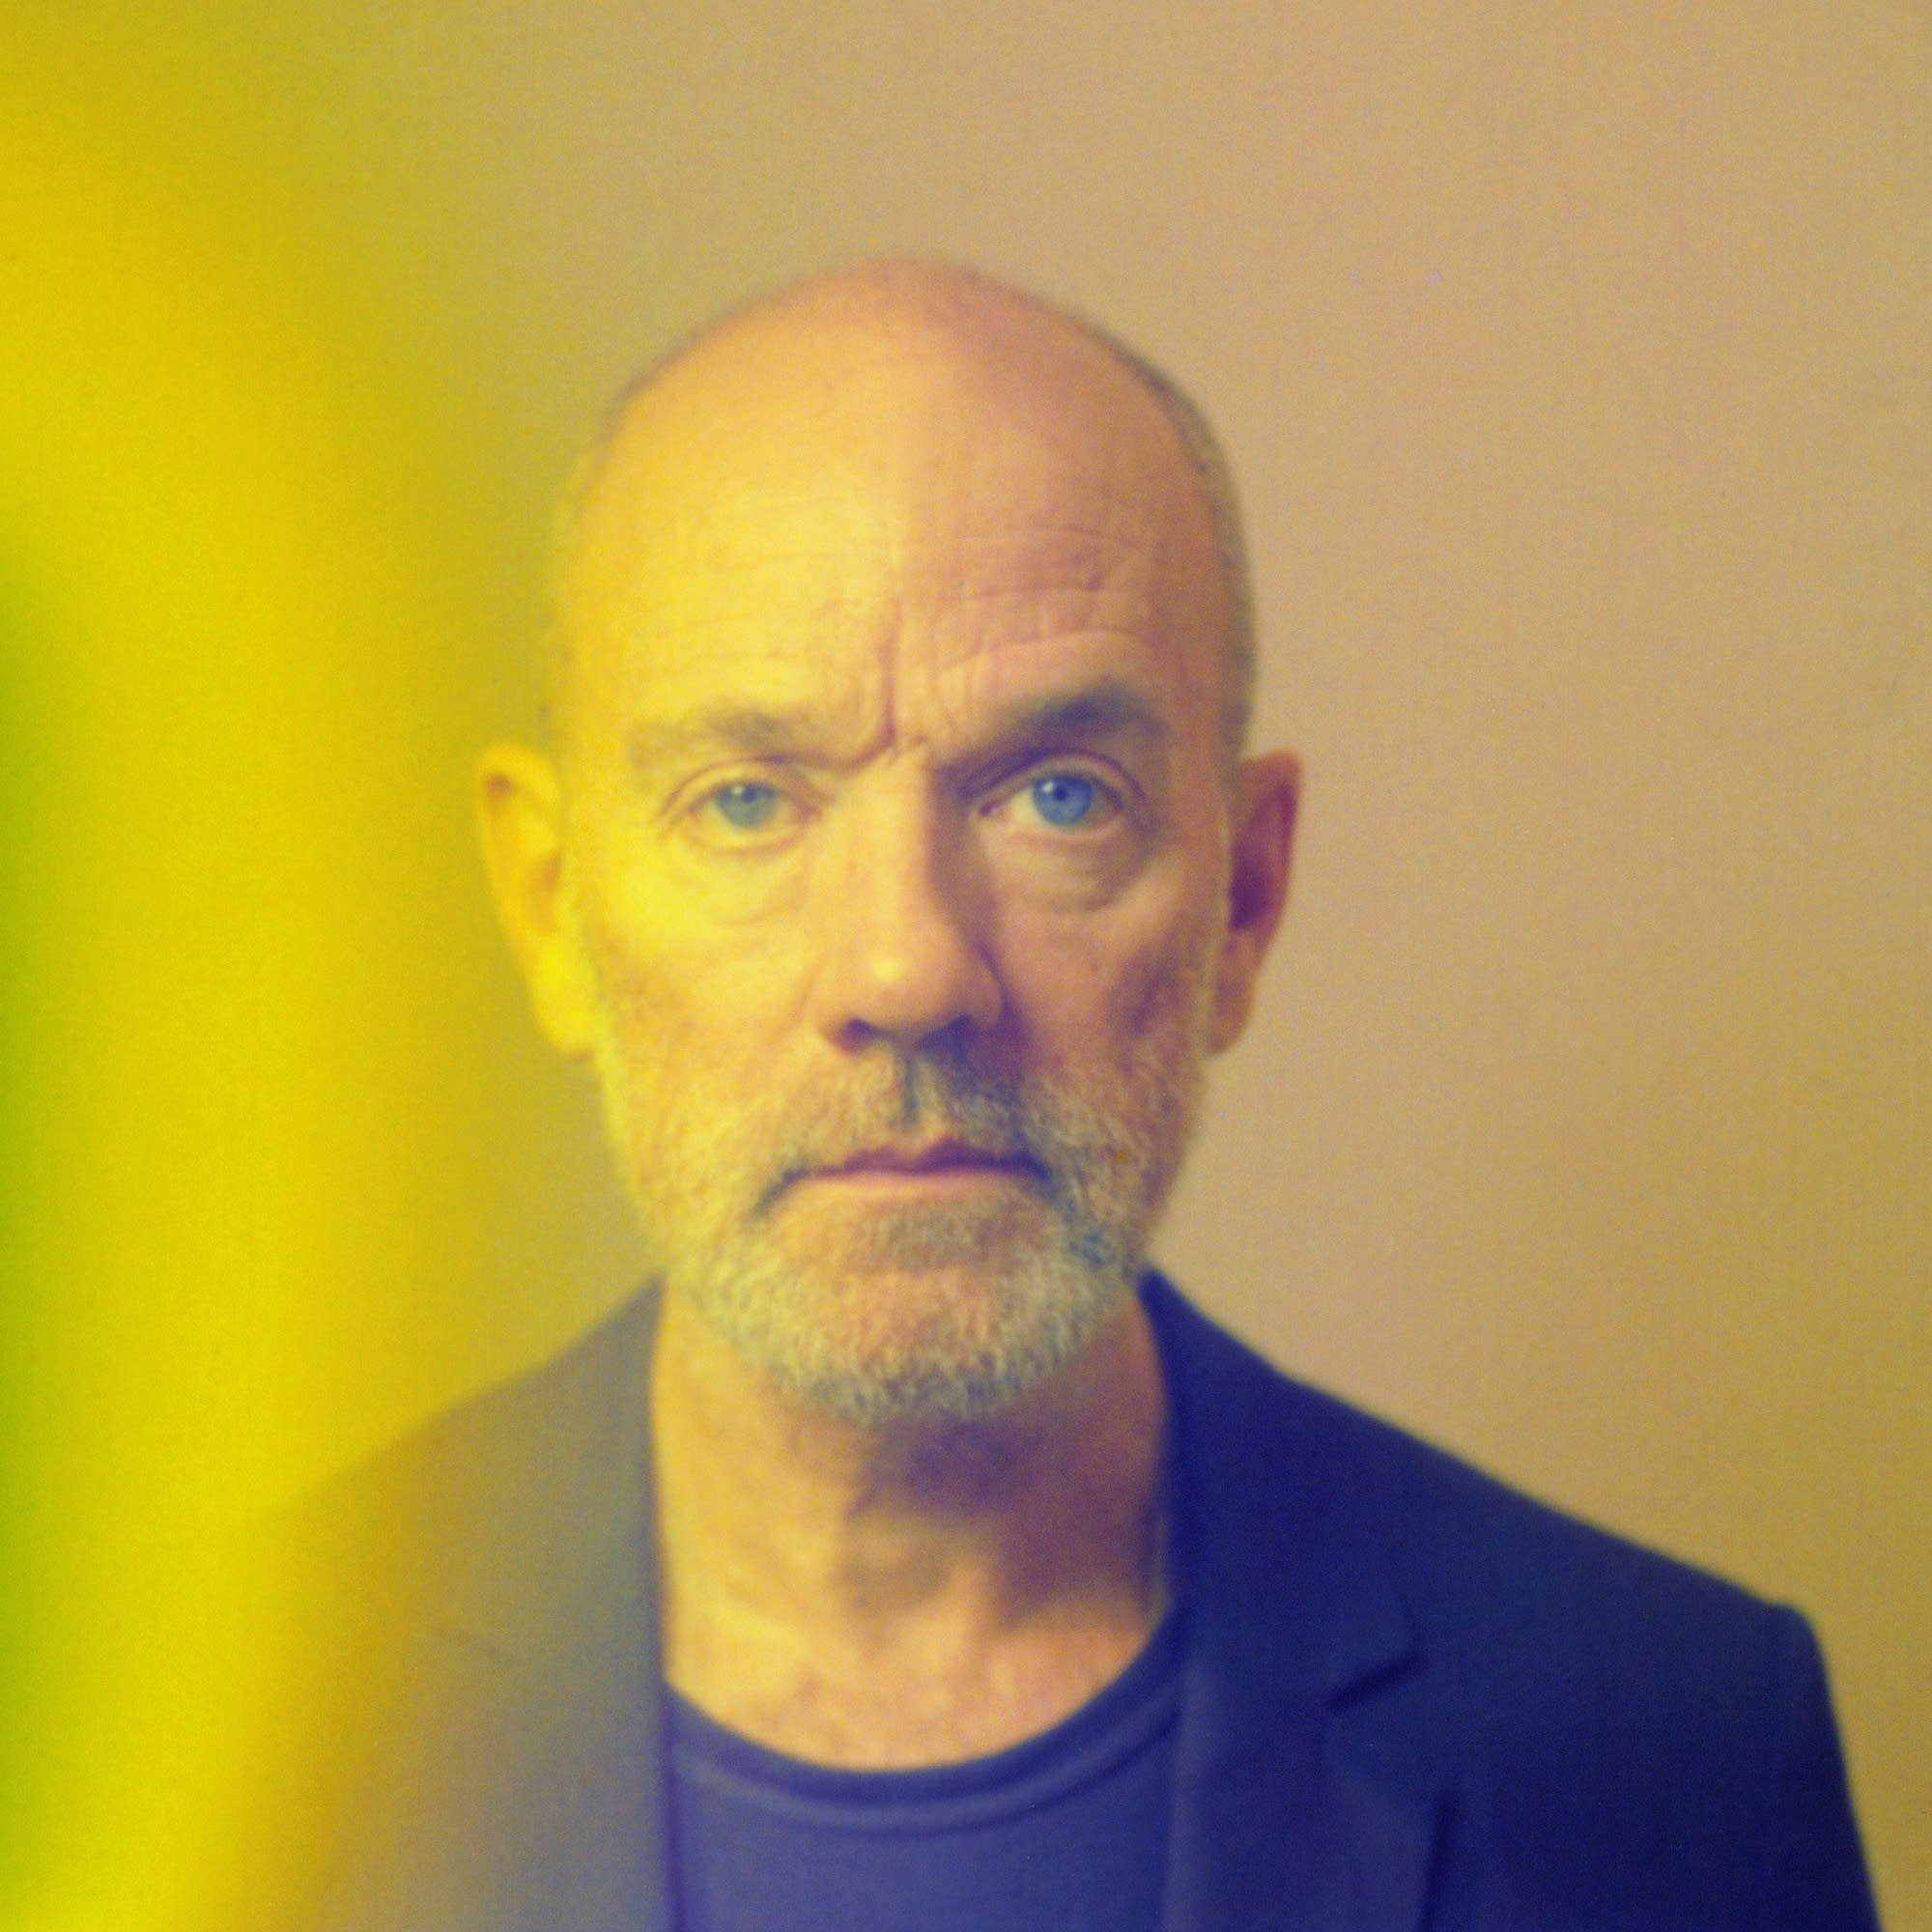 Michael Stipe 2019 press photo